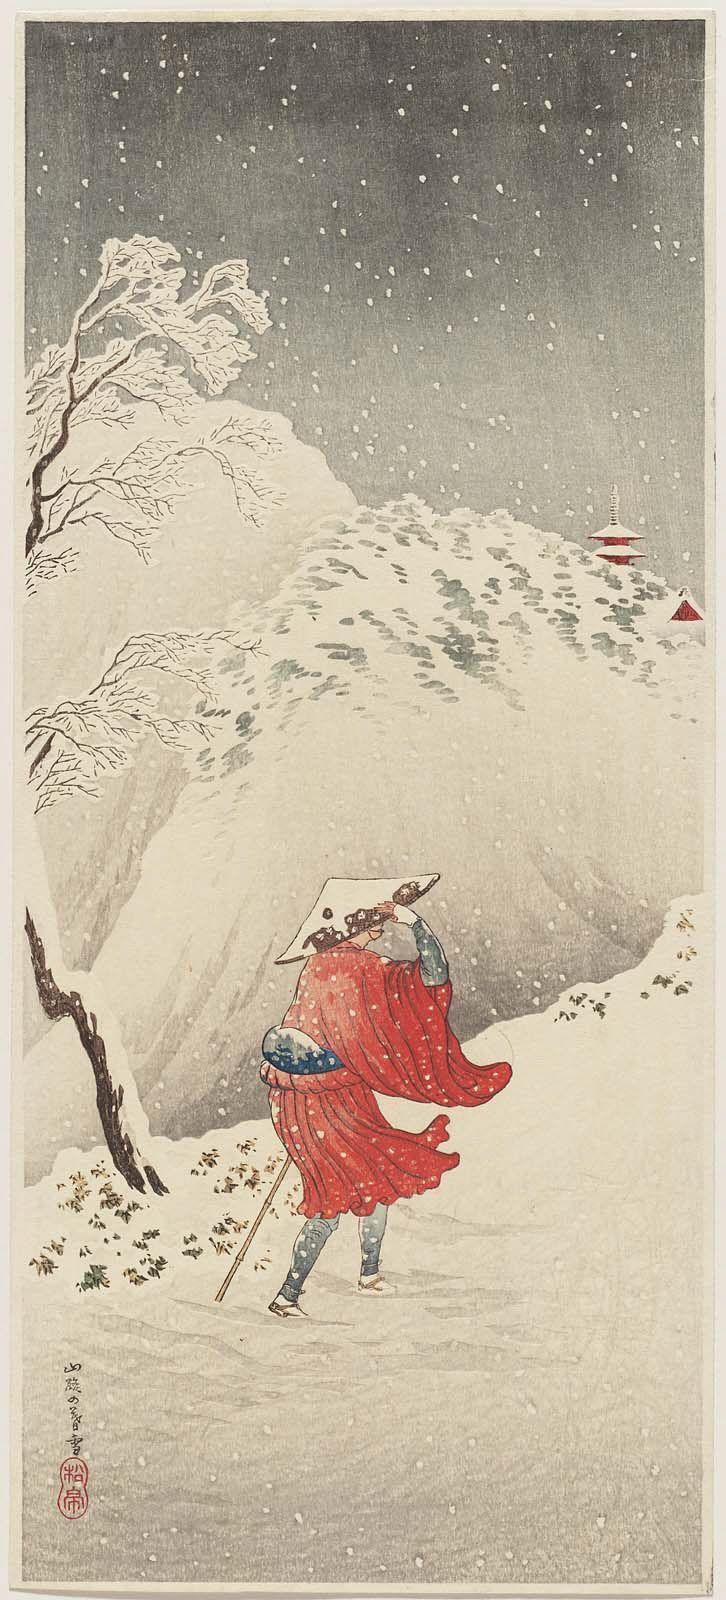 heaveninawildflower:  'Twilight Snow on the Mountain Road' (circa 1936) byTakahashi Hiroaki (Shôtei) (1871–1945). Publisher Watanabe Shôzaburô Image and text courtesy MFA Boston.